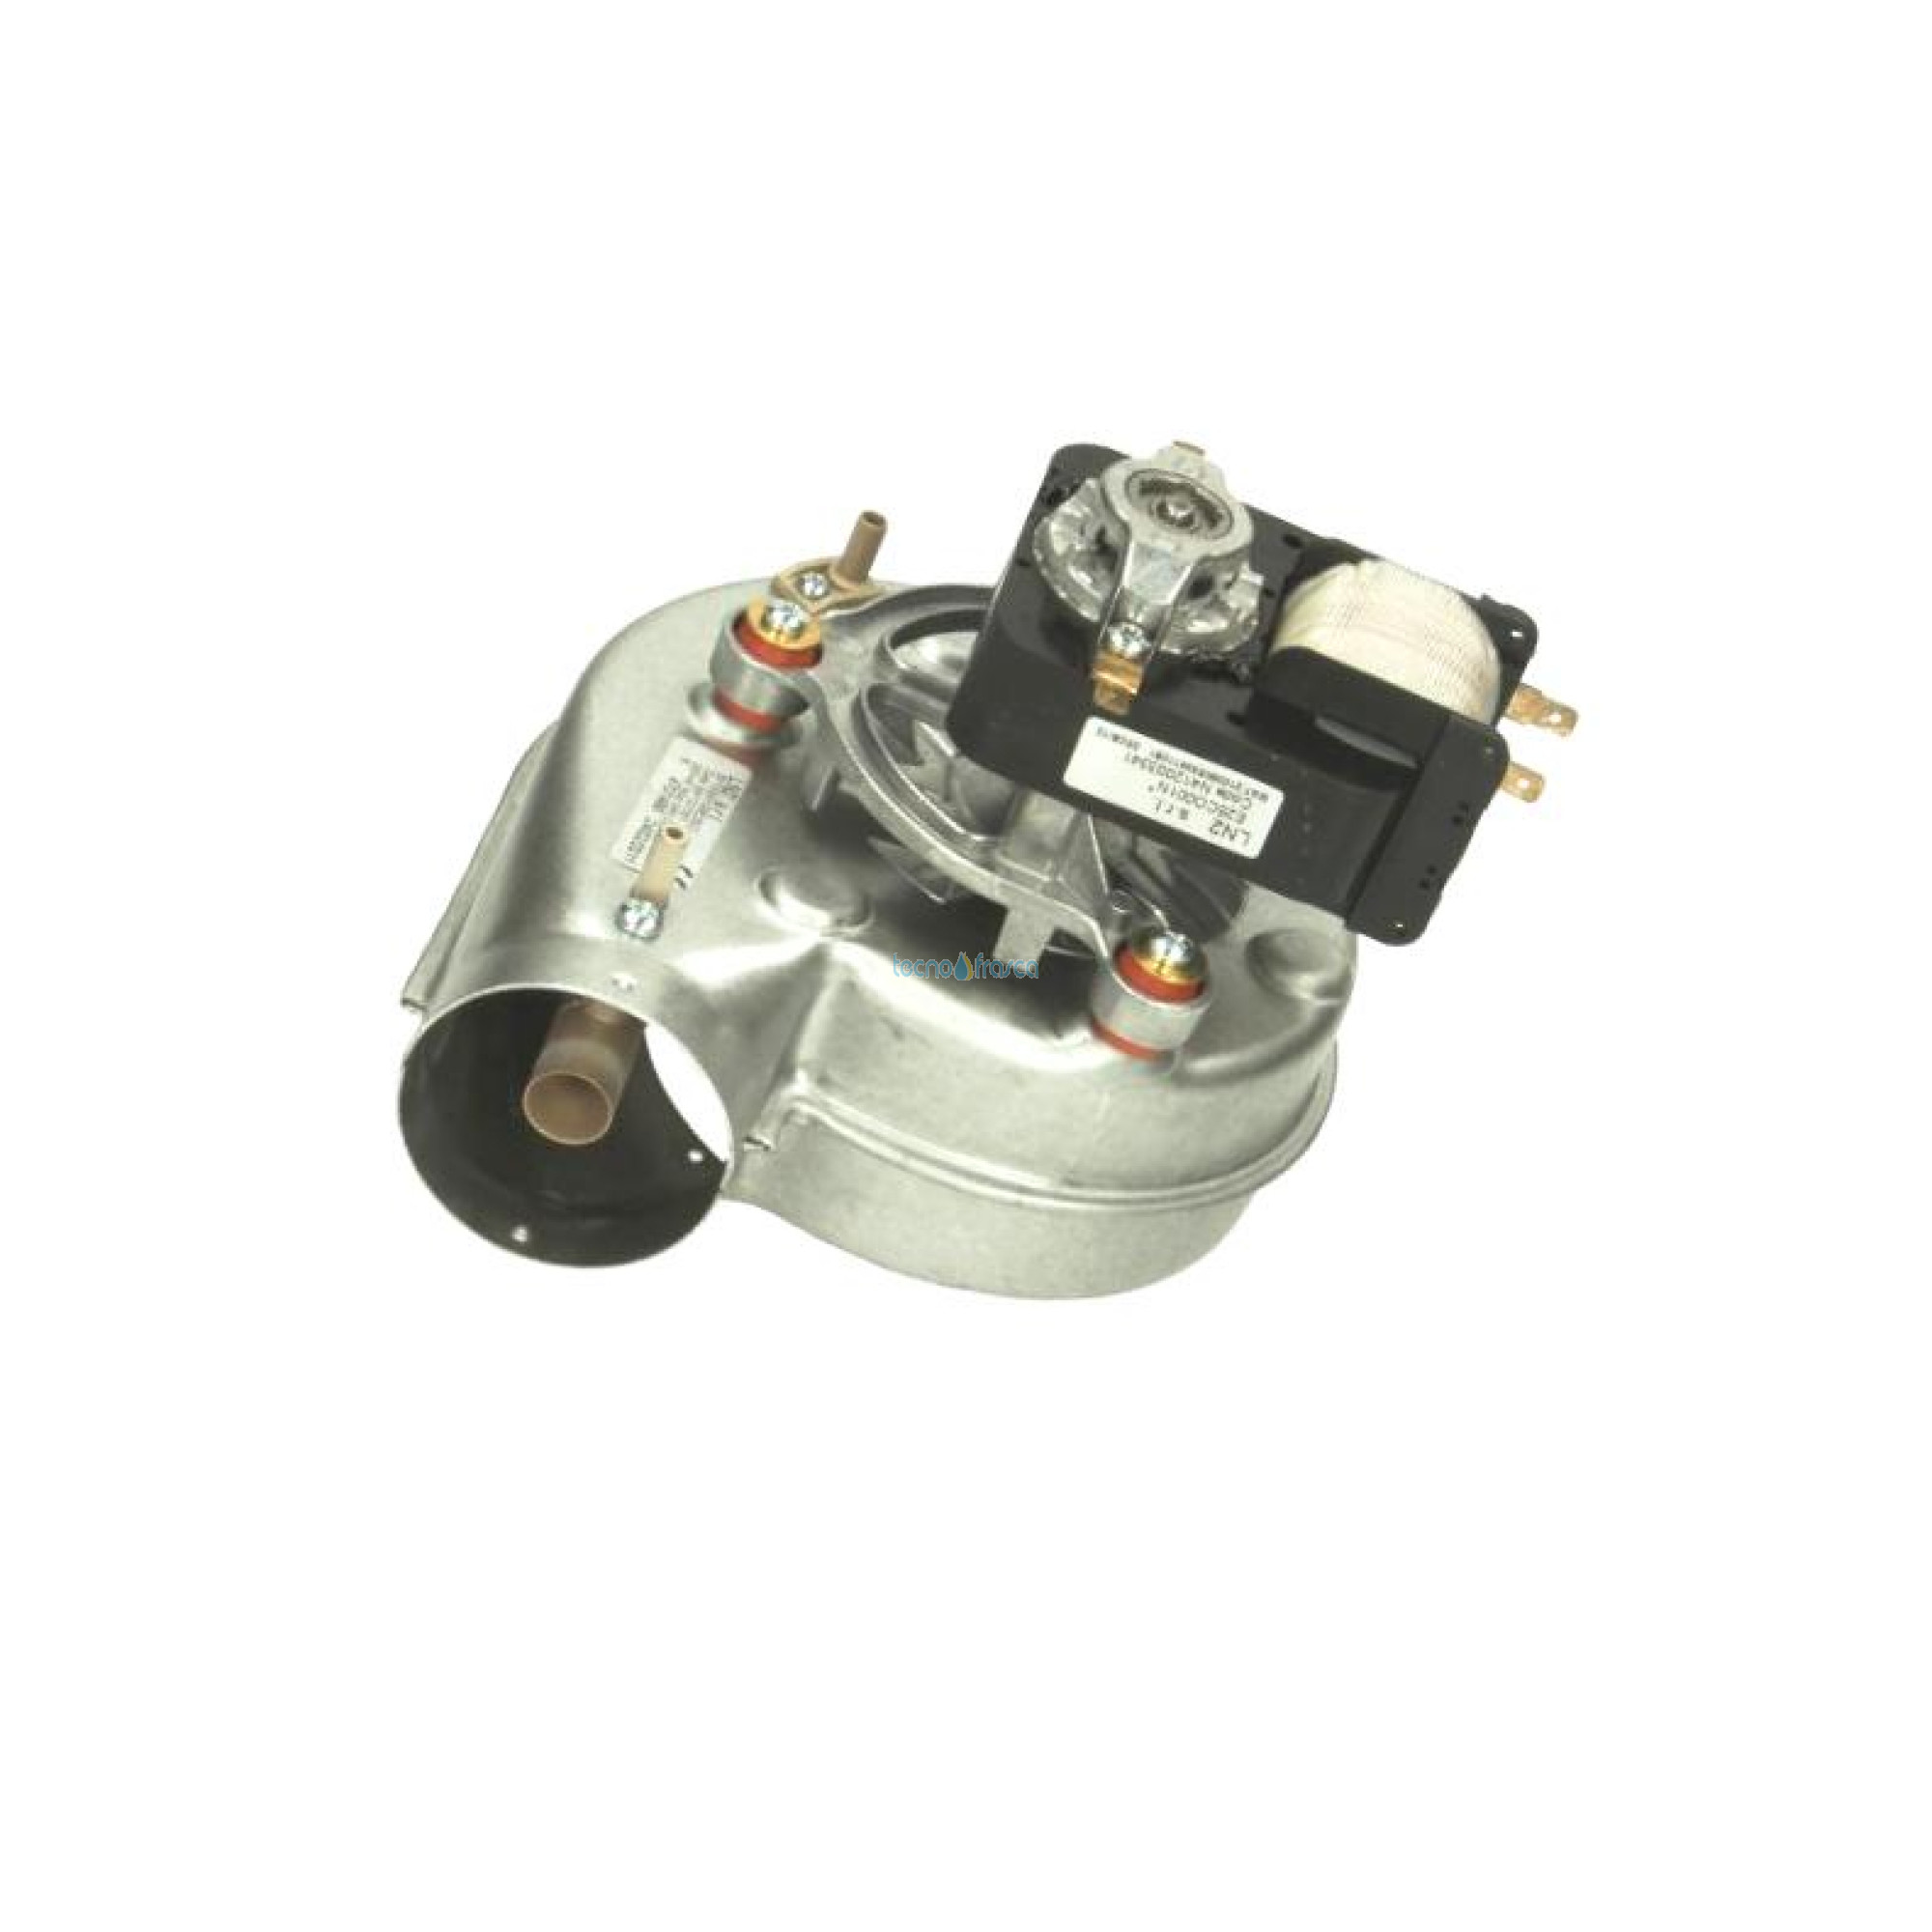 Savio Biasi estrattore sit M90.28S bi1336116